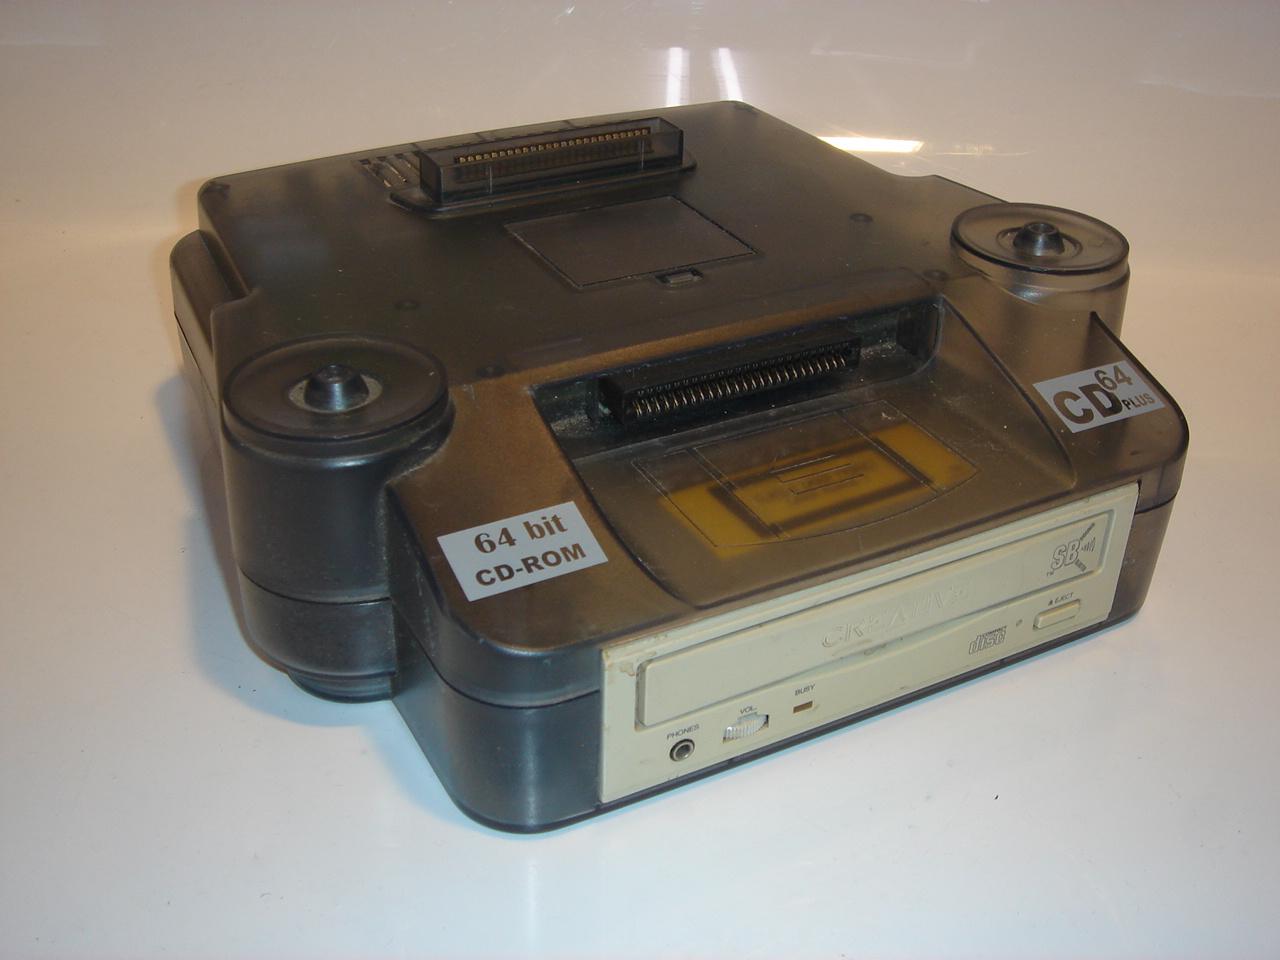 CD64 | Video Game Development Devices Wiki | FANDOM powered by Wikia